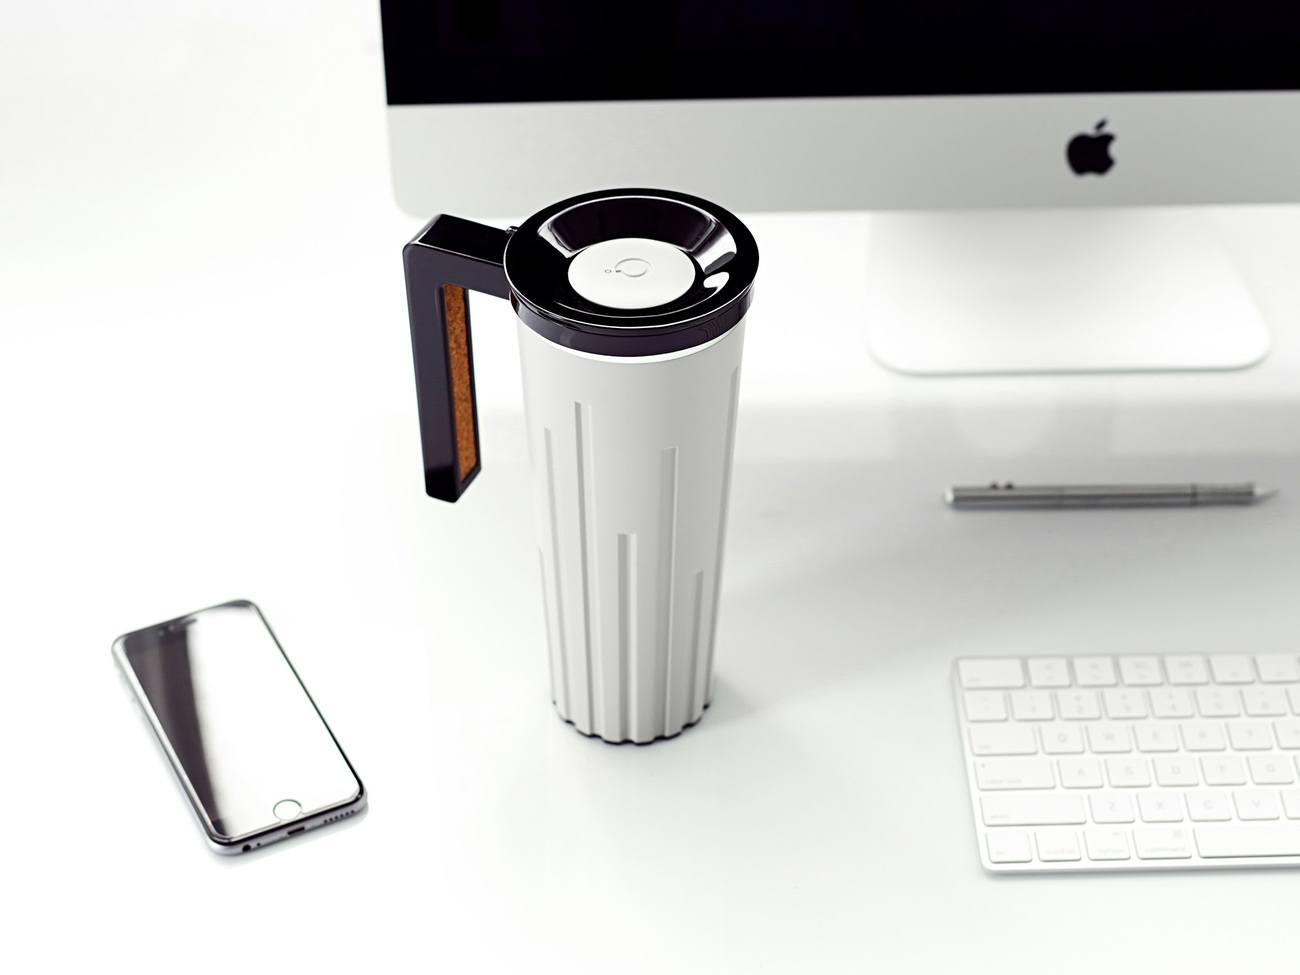 Muggino Self-Powered Smart Mug